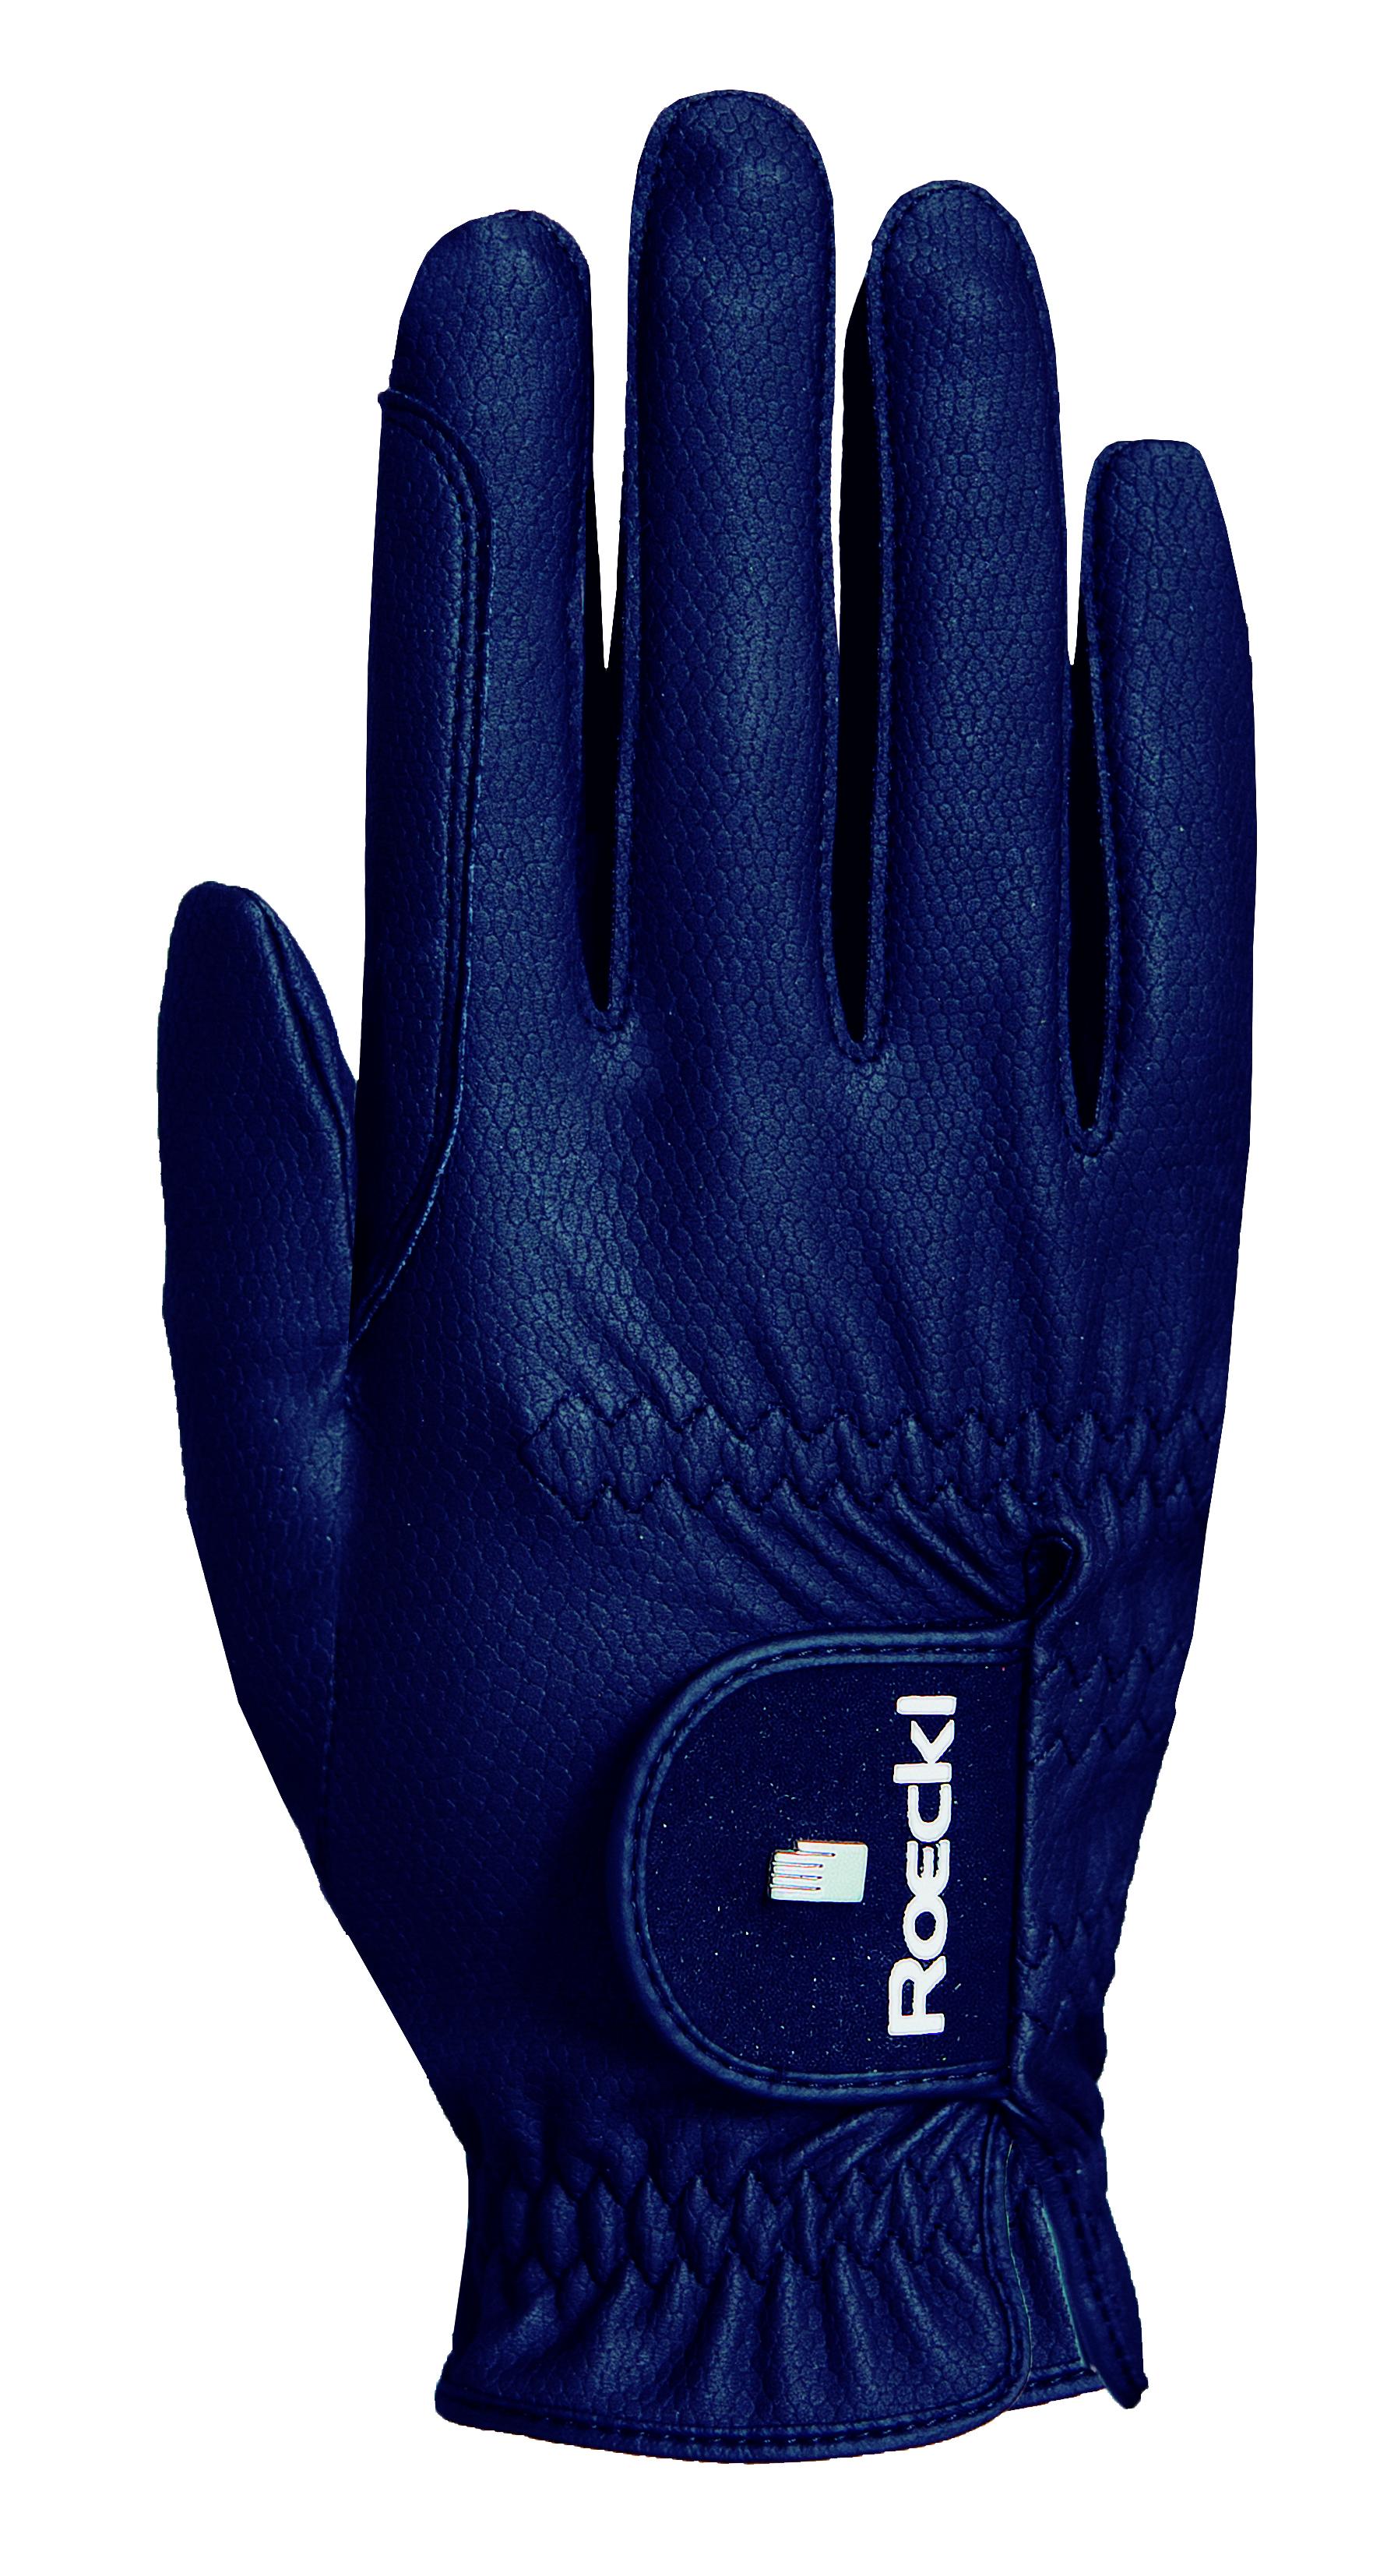 3301-108-590 Roeck-Grip Pro